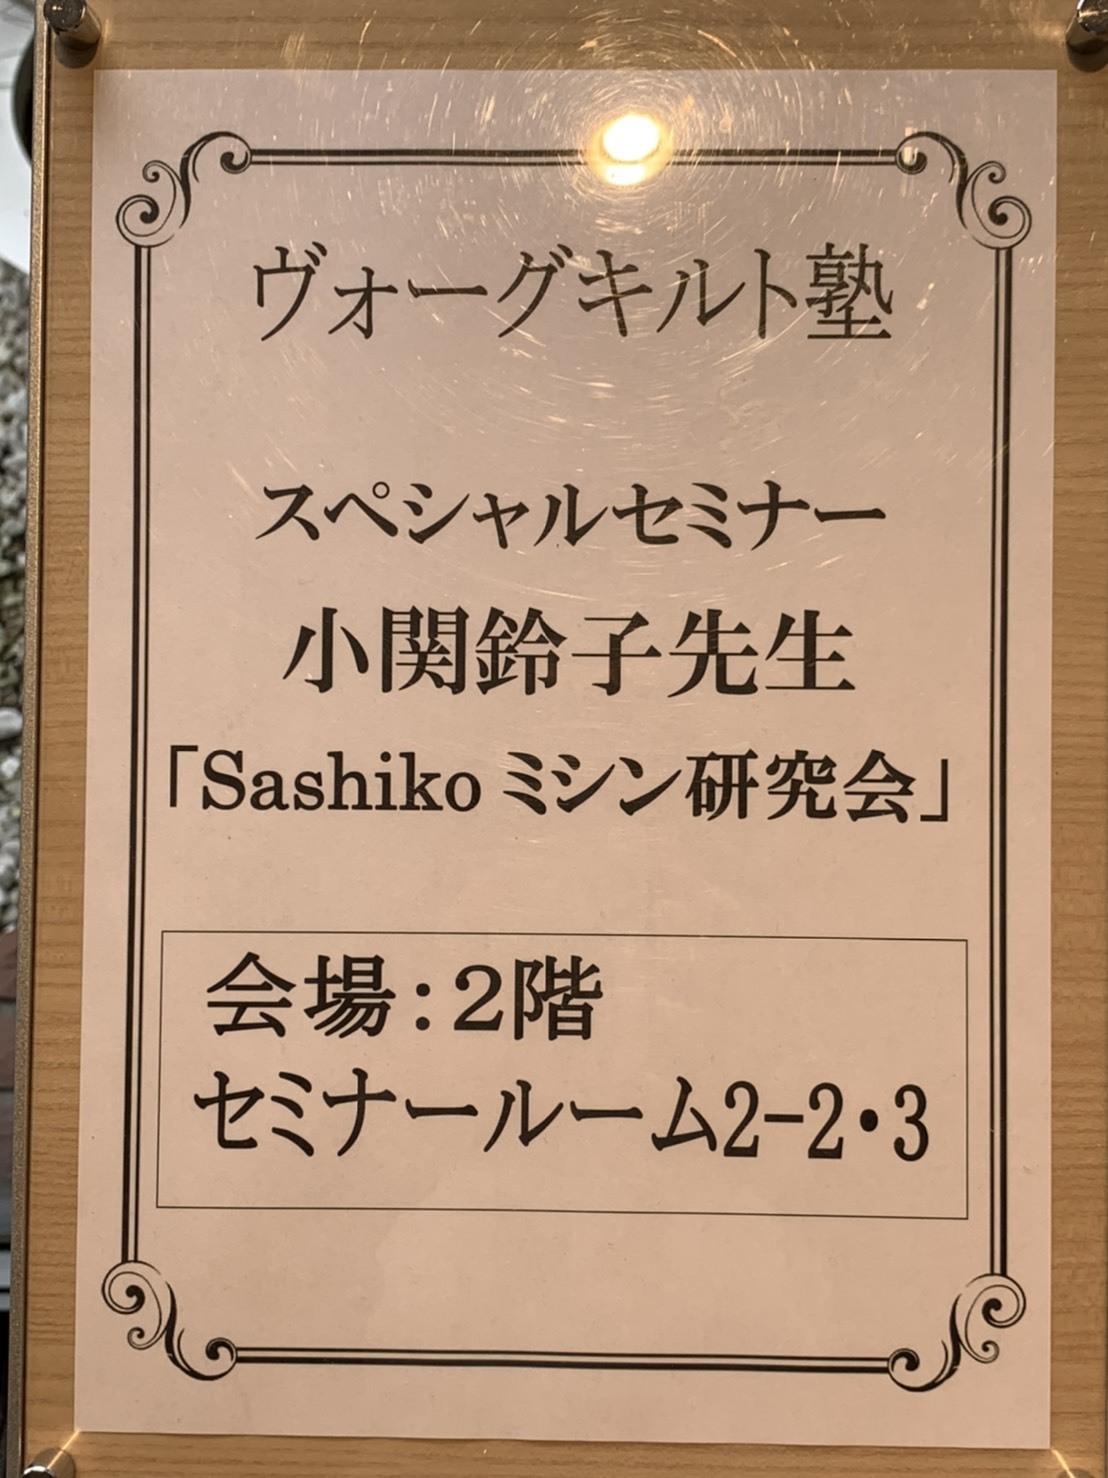 Sashikoミシン講習会_c0086102_13503817.jpeg